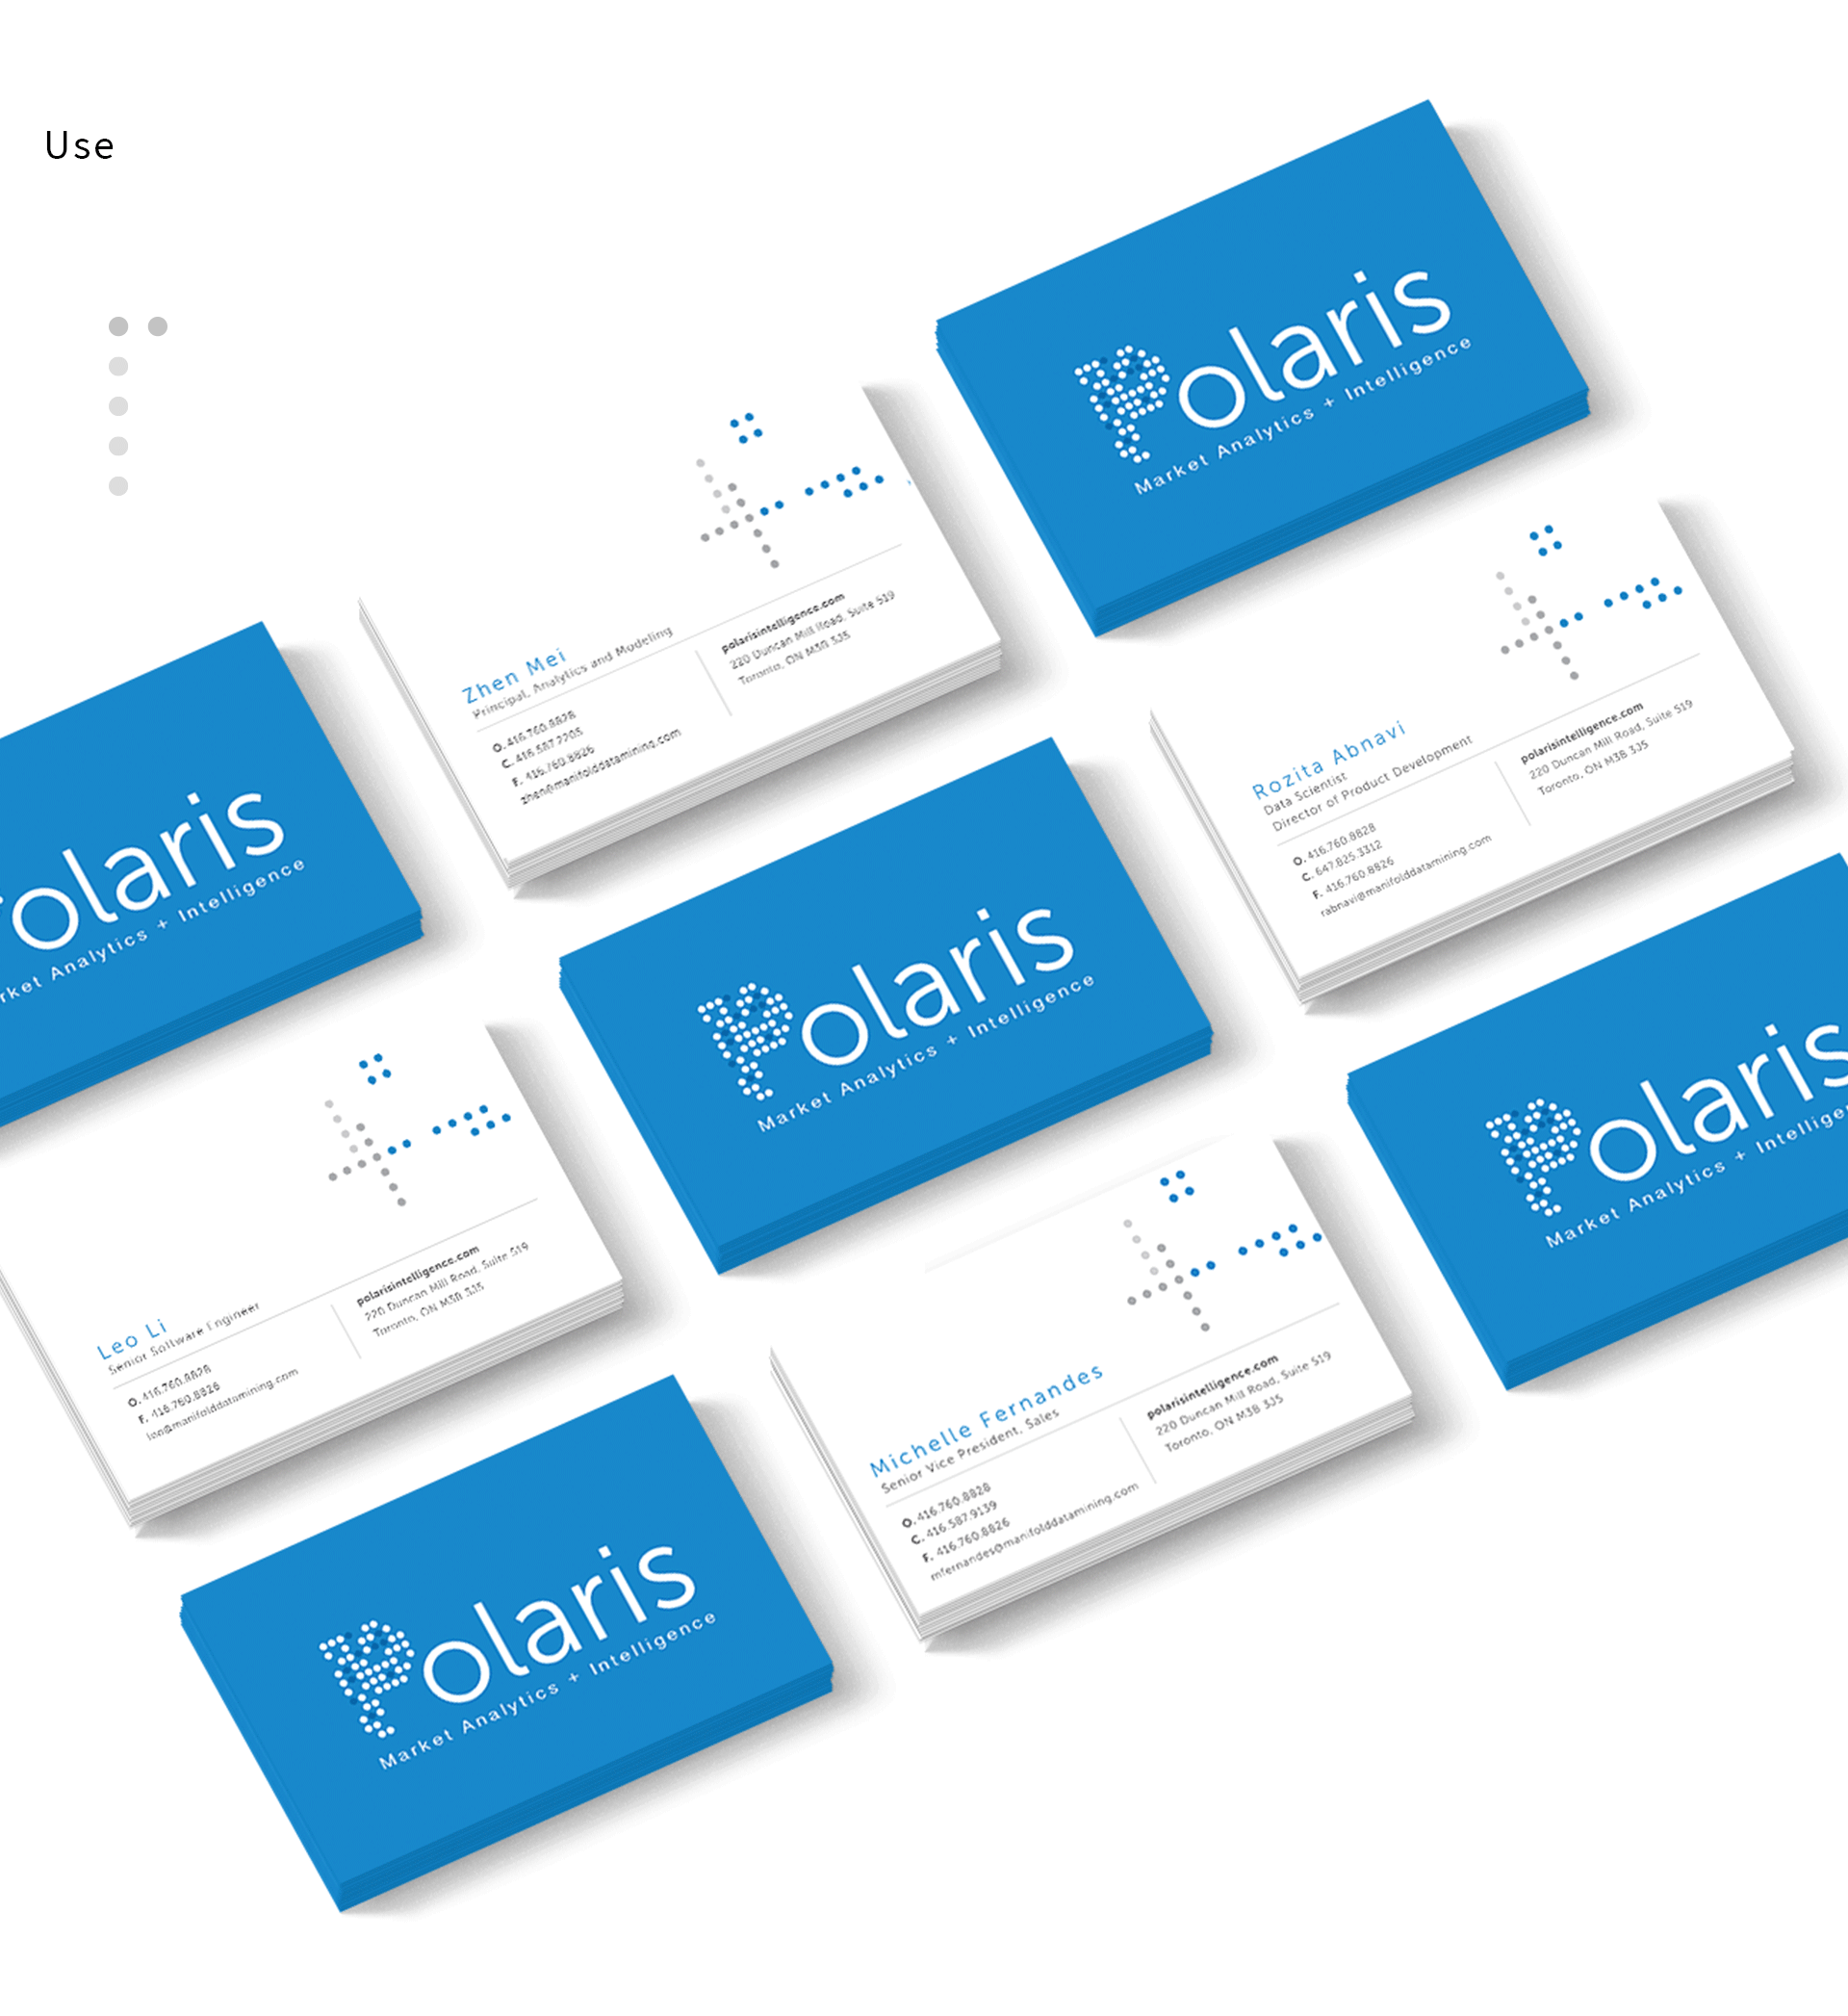 6-polaris-brand